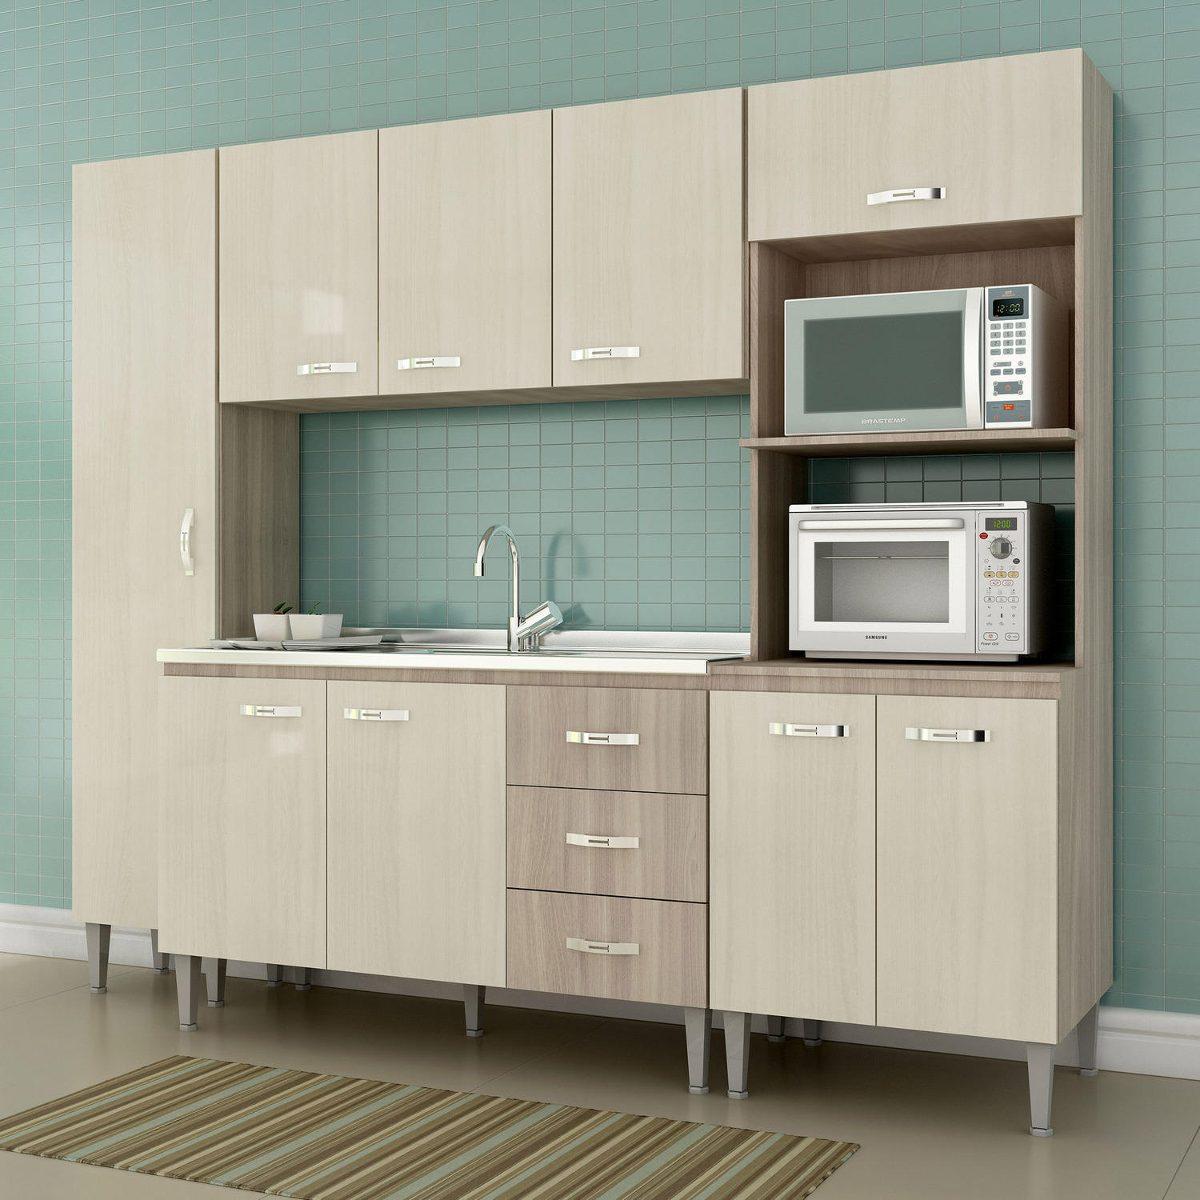 Cozinha Completa 4 Pe As Master Siena M Veis Sbianca Hi R 729 90